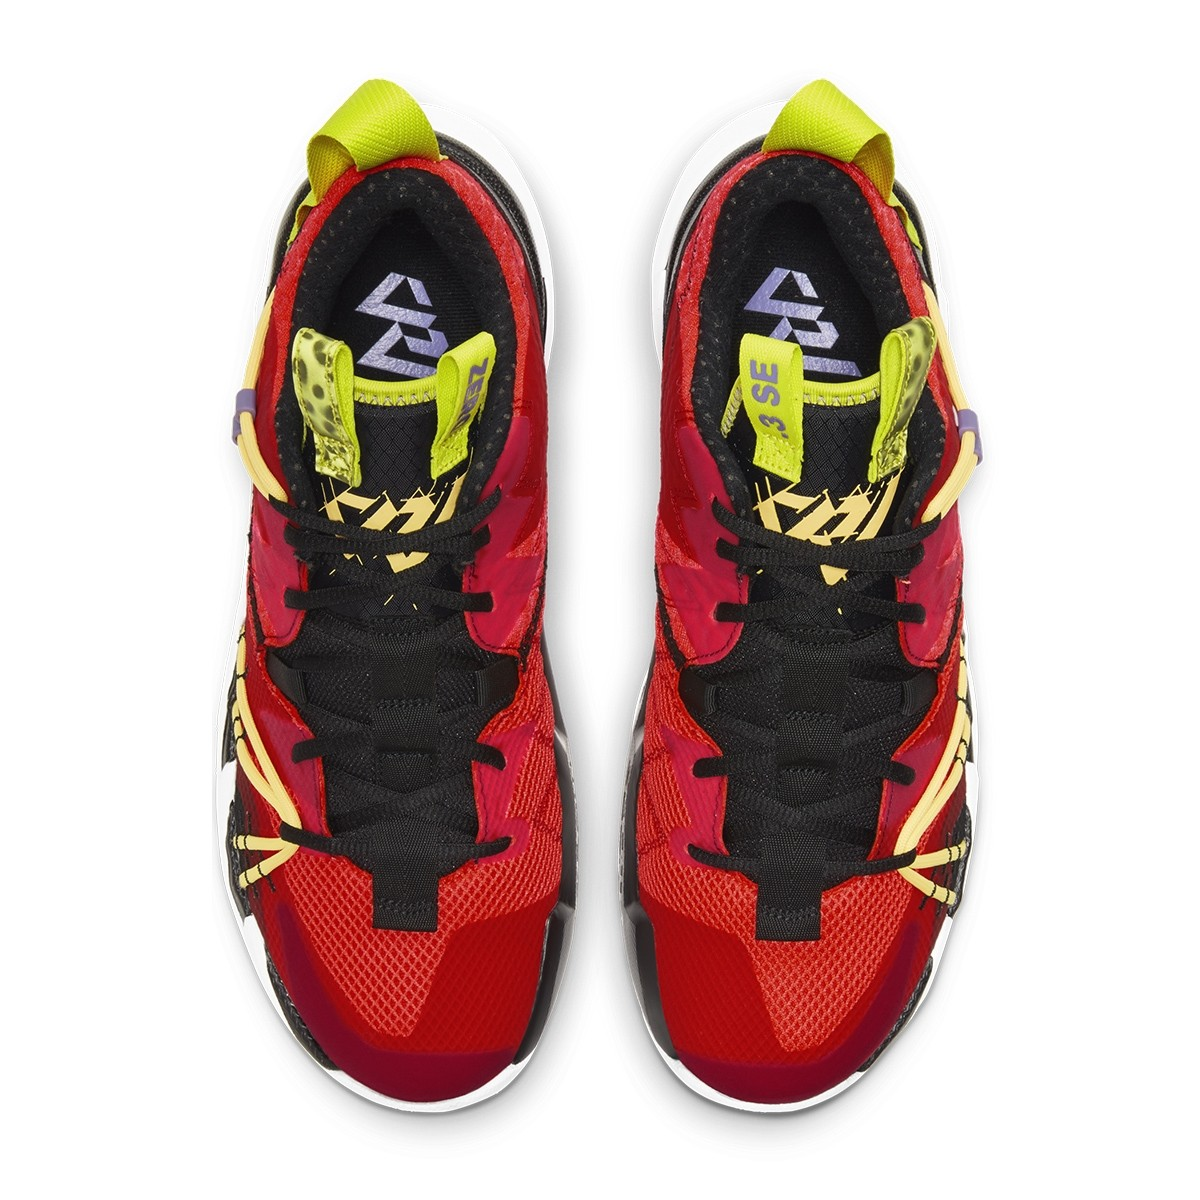 Jordan Why Not Zer0.3 SE 'Bright Crimson'-CK6611-600